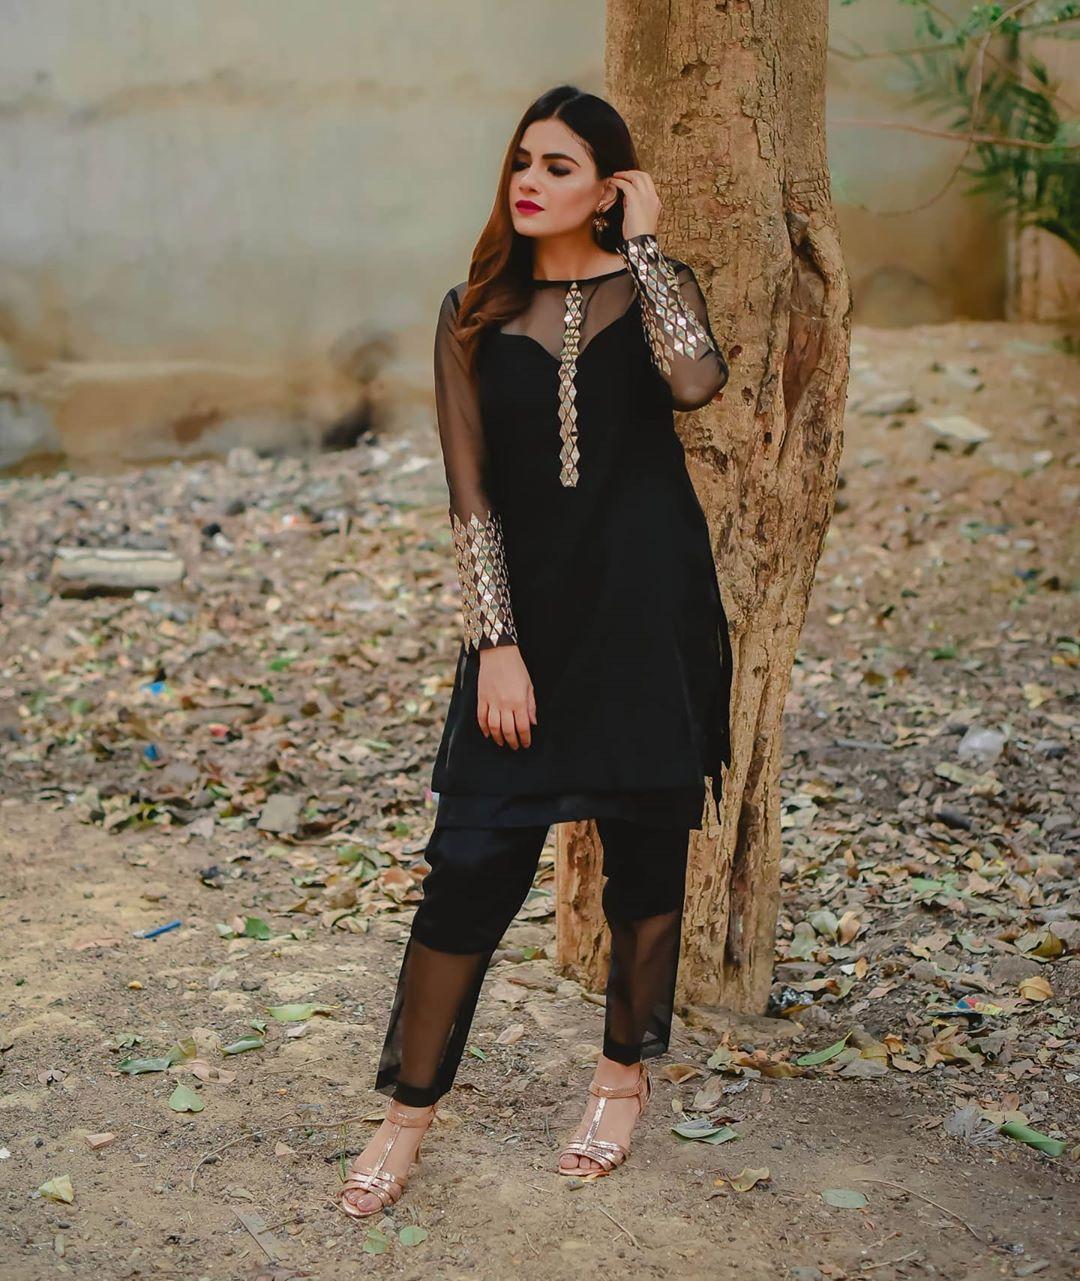 Saad Ibrahim On Instagram Beautiful Maryam Jafri19 Epitomizing Sophisticated Glamour In Saa Fashionista Clothes Fancy Dress Design Pakistani Fashion Casual [ 1281 x 1080 Pixel ]